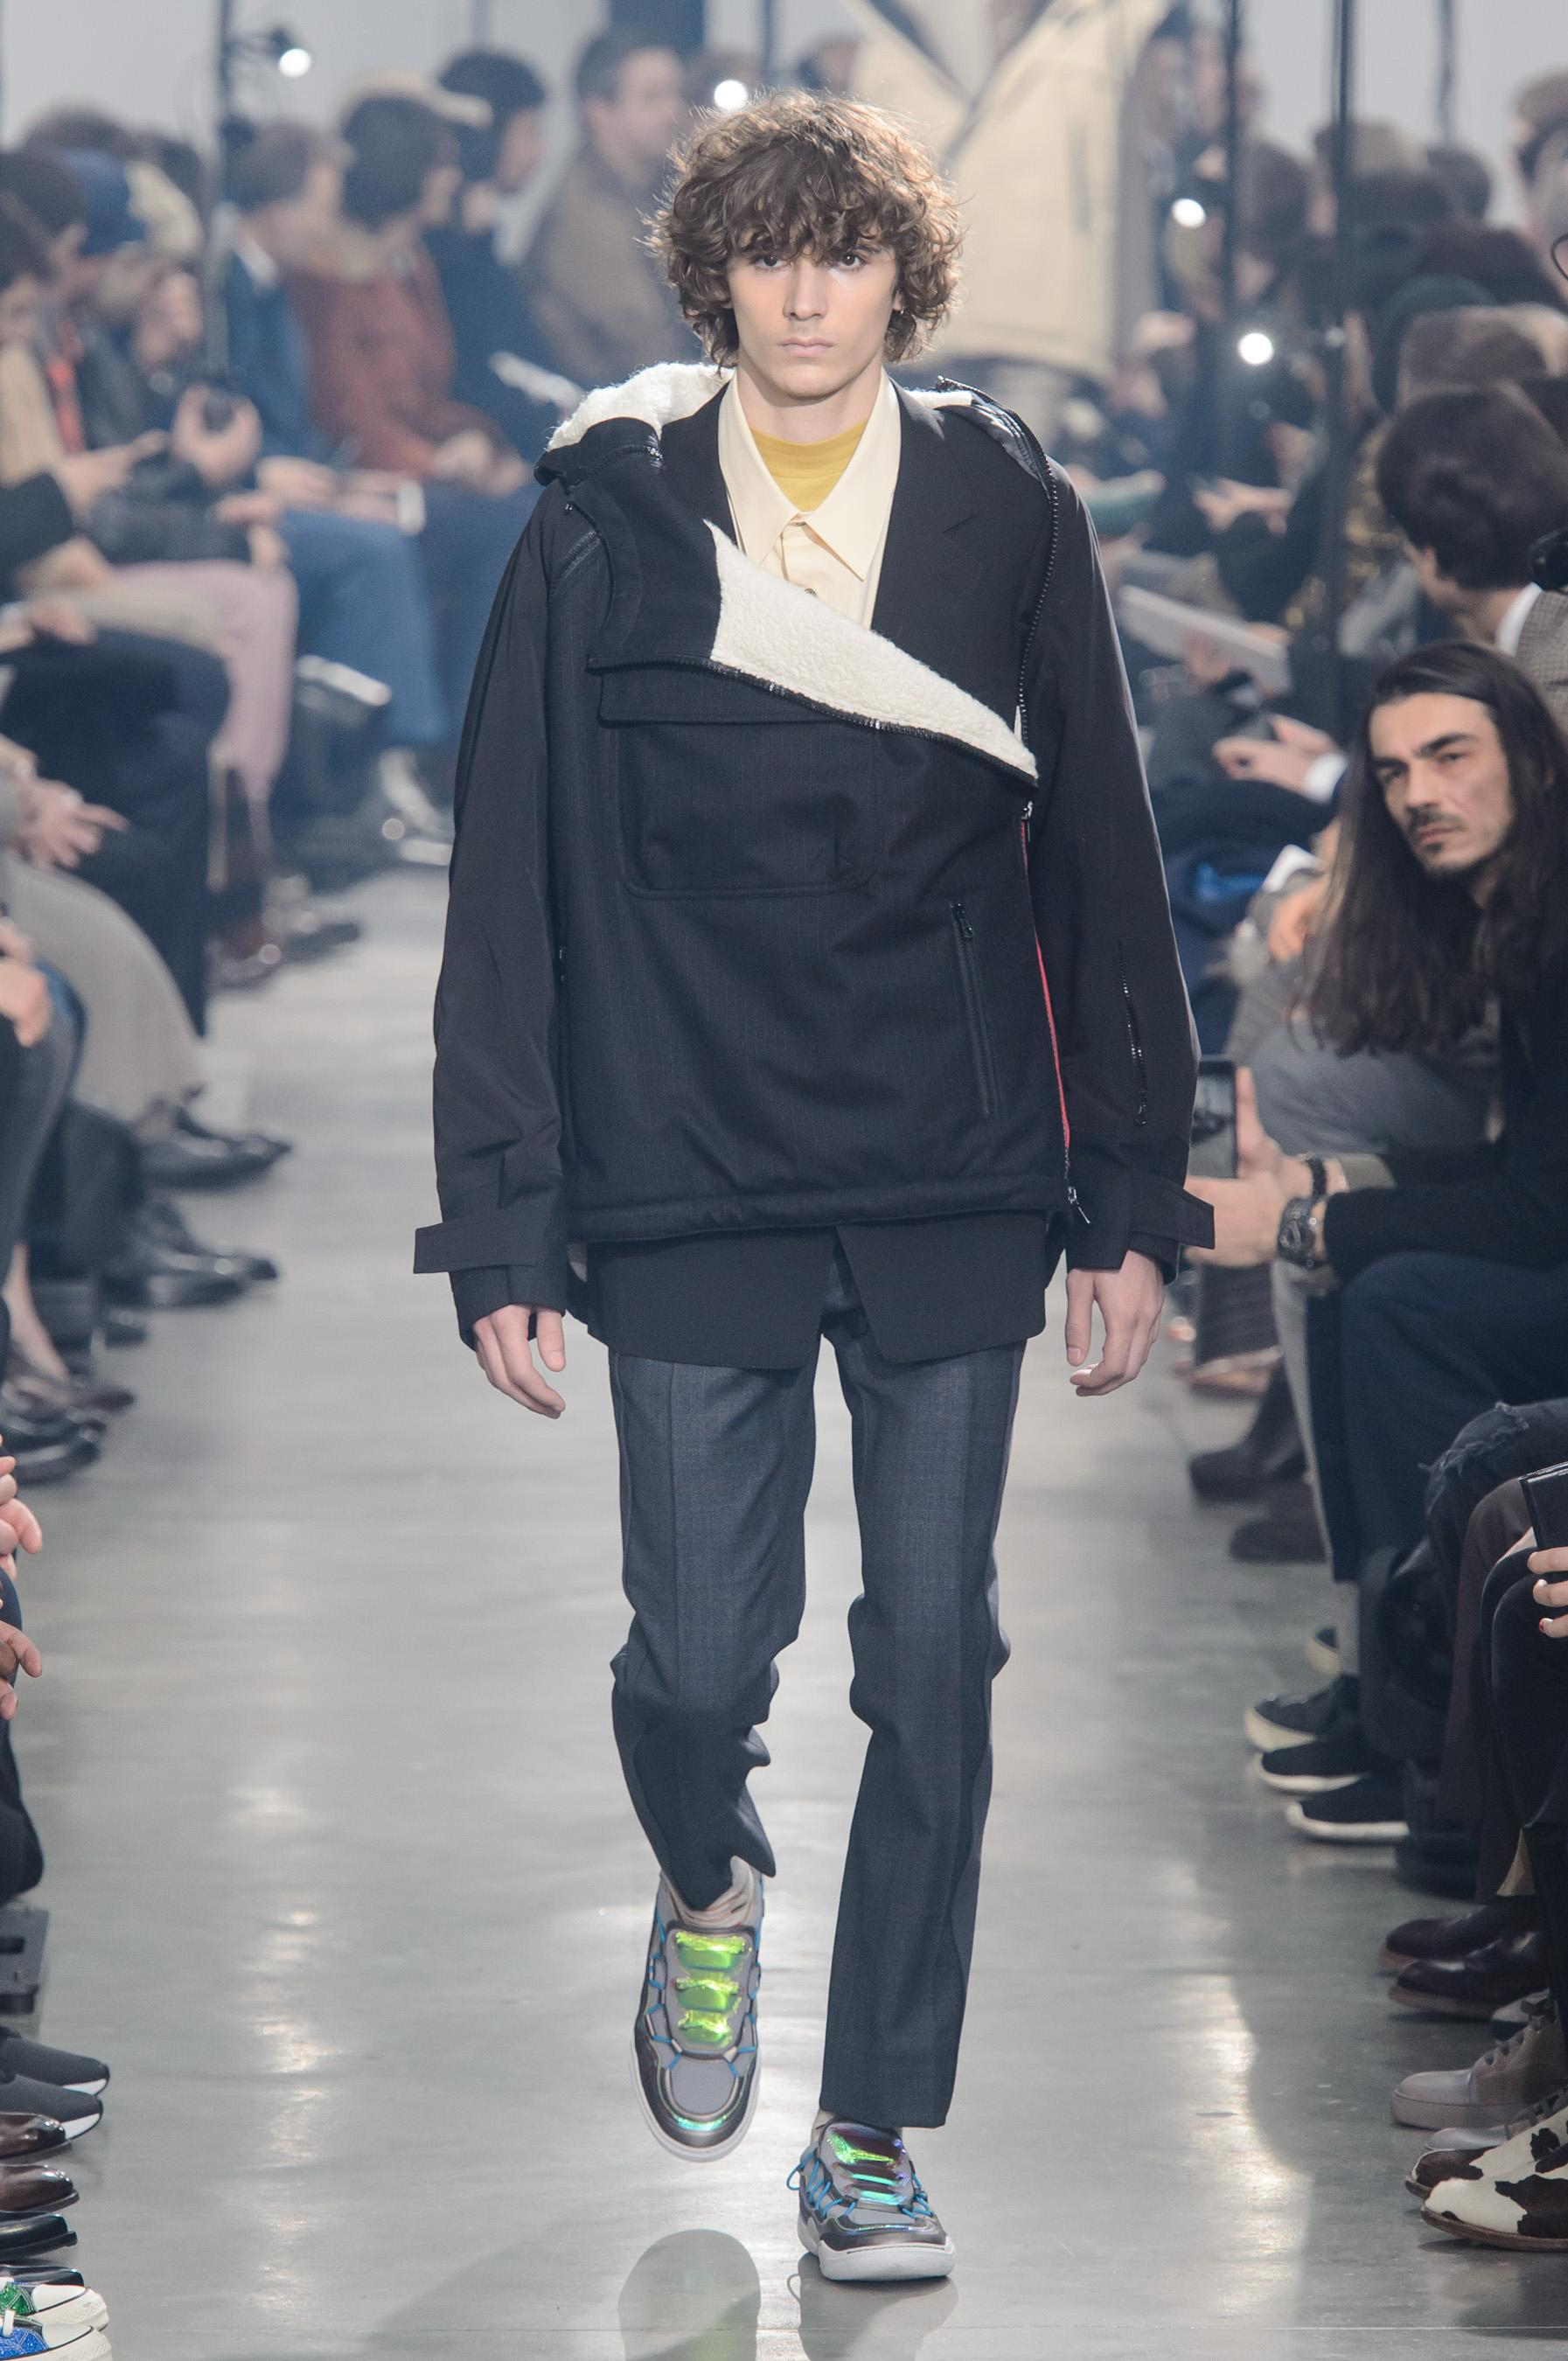 Défilé Lanvin automne-hiver 2018-2019 Homme - Madame Figaro 67ddfbf80ee